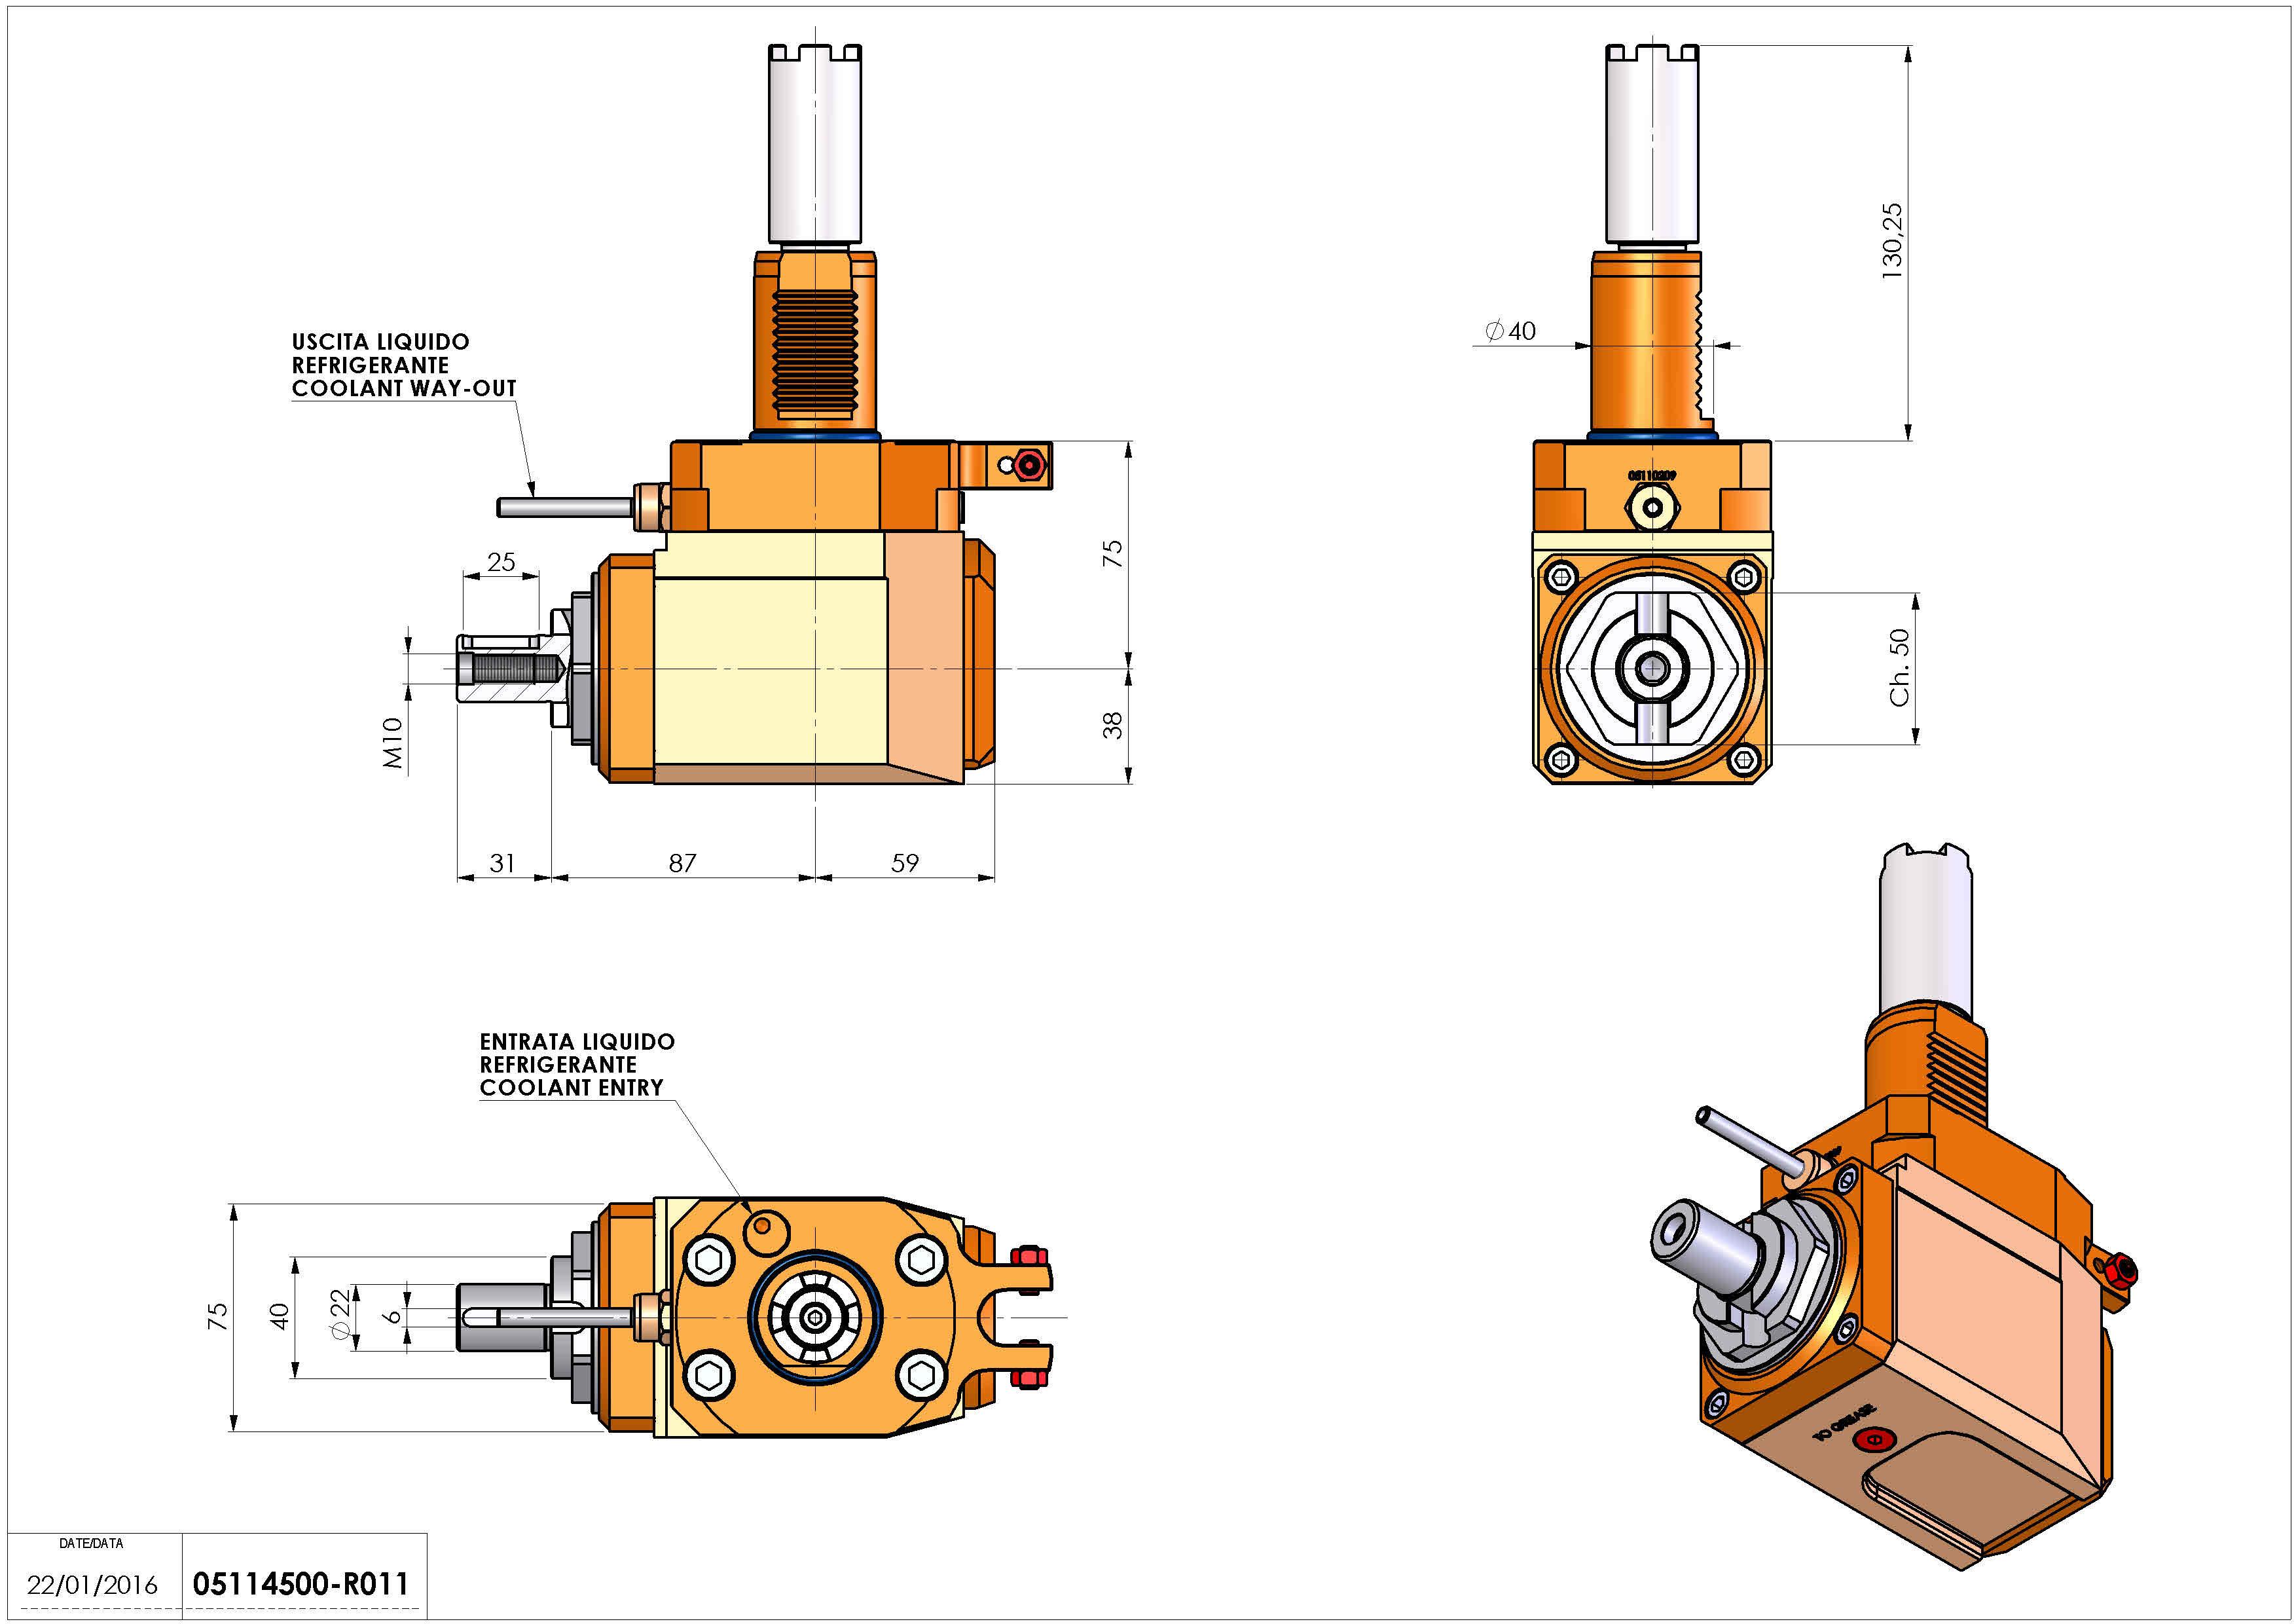 Technical image - LT-A VDI40 DIN22 H75 130 HA.